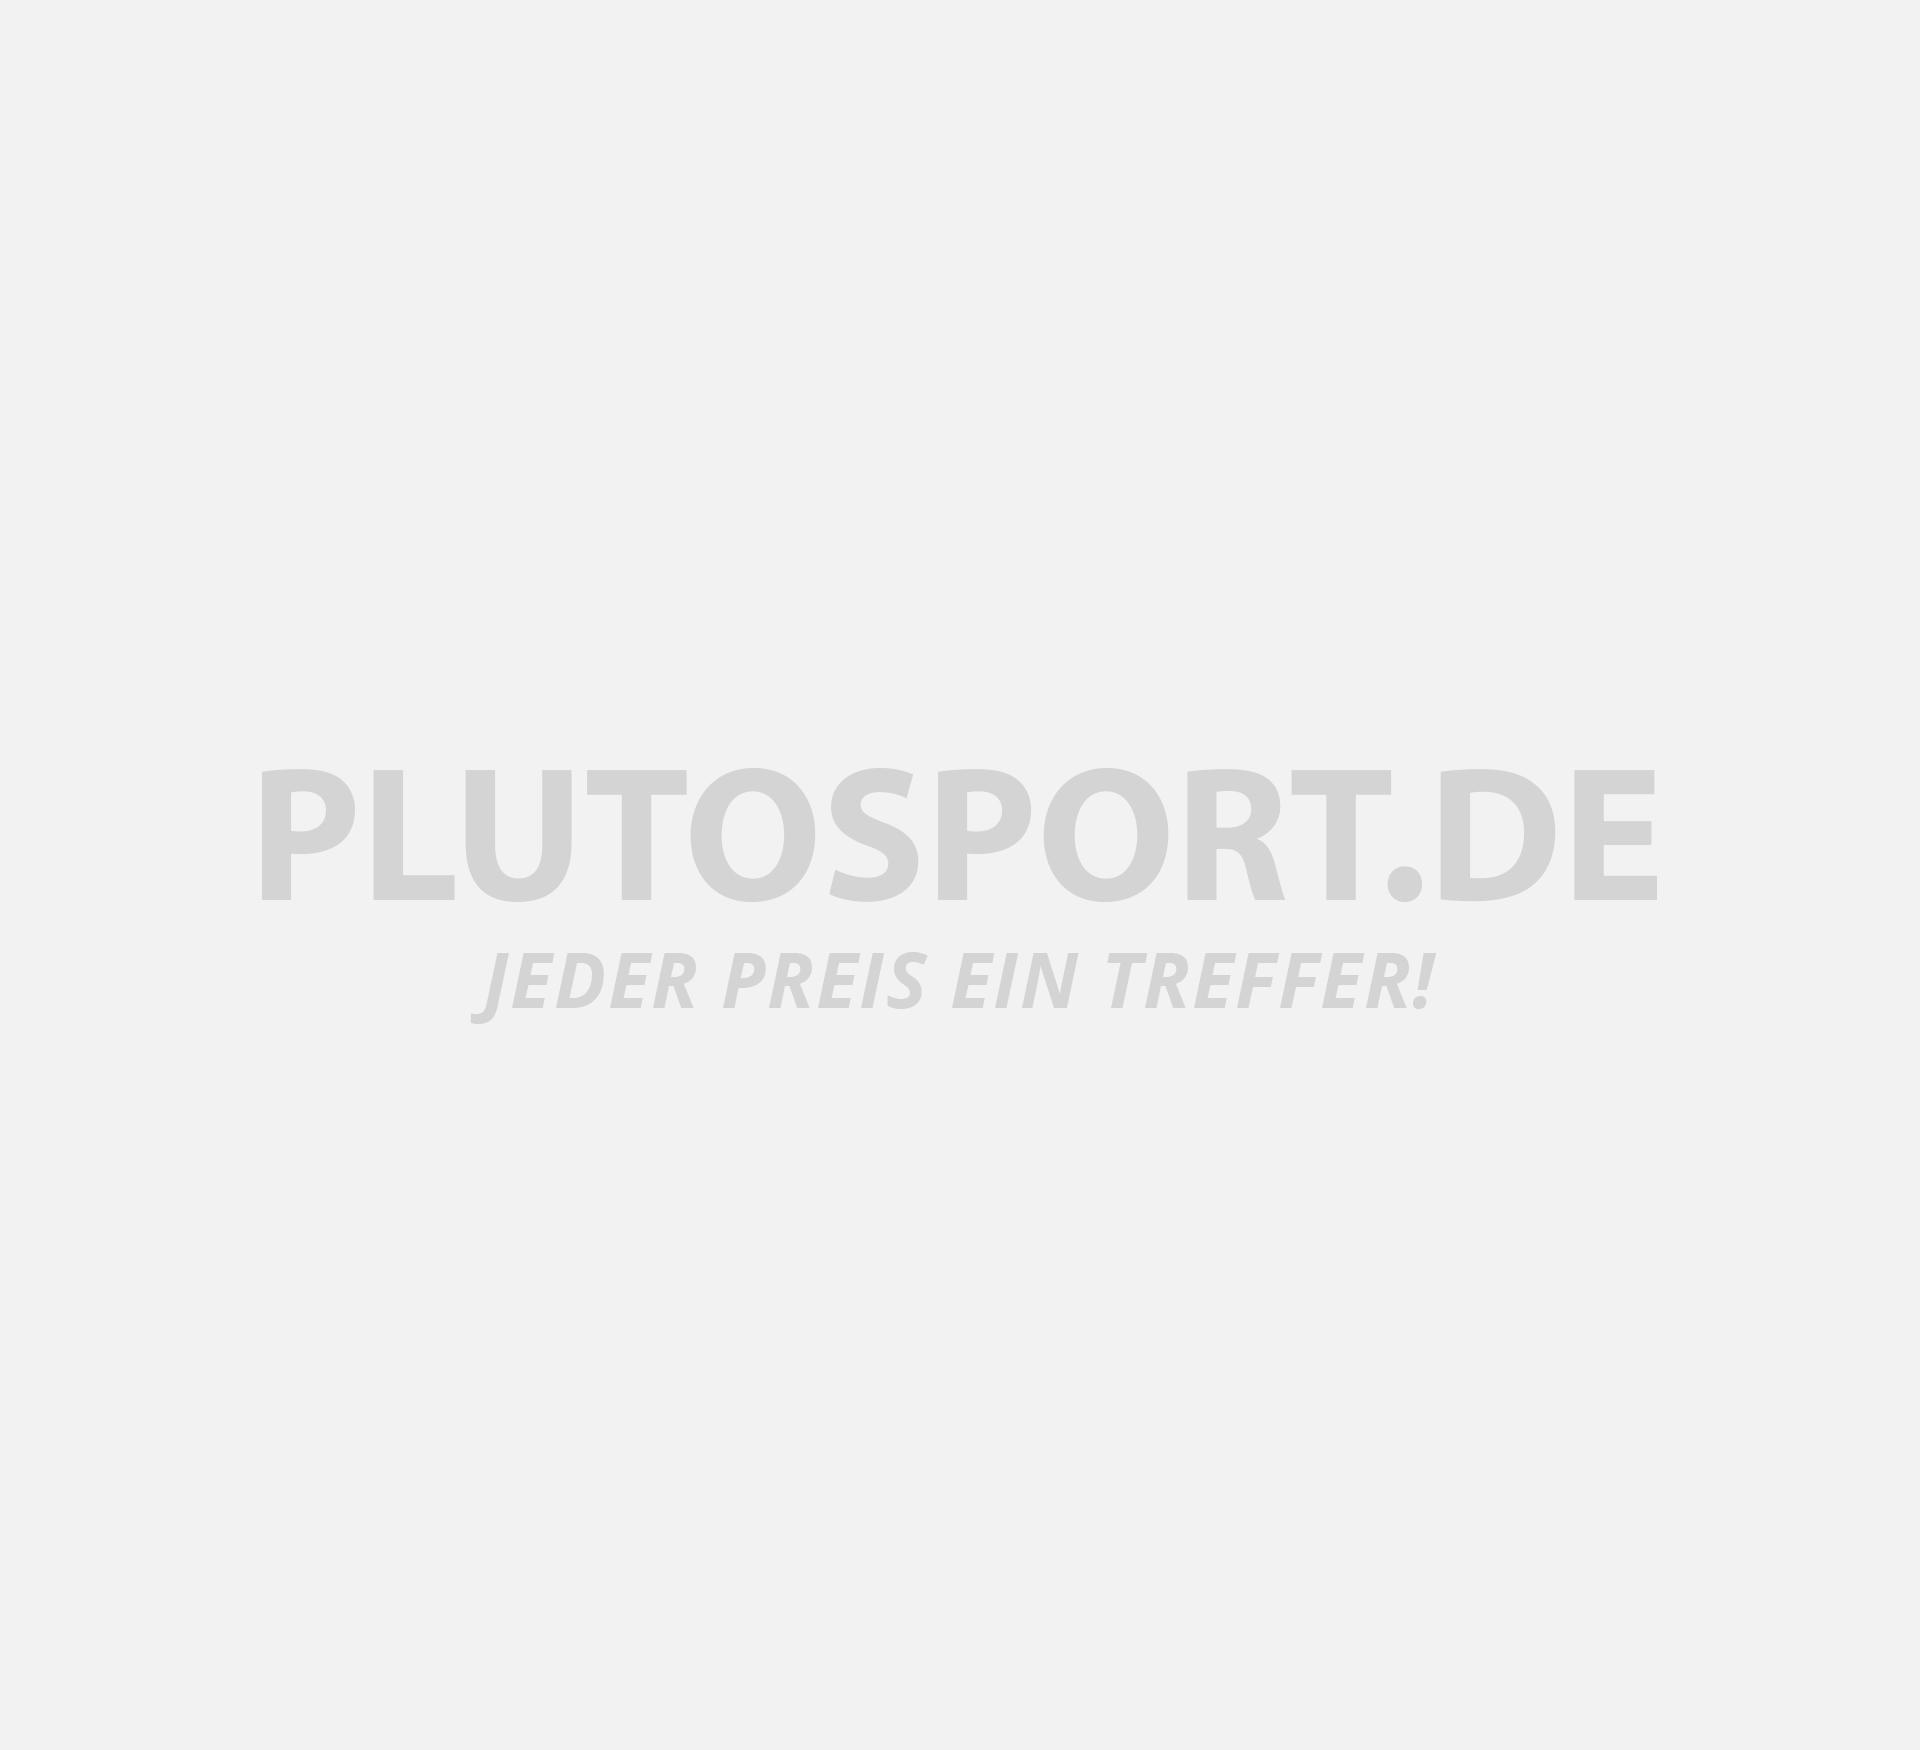 adidas Tango Jogginghose Herren grau, 2XL 6062: